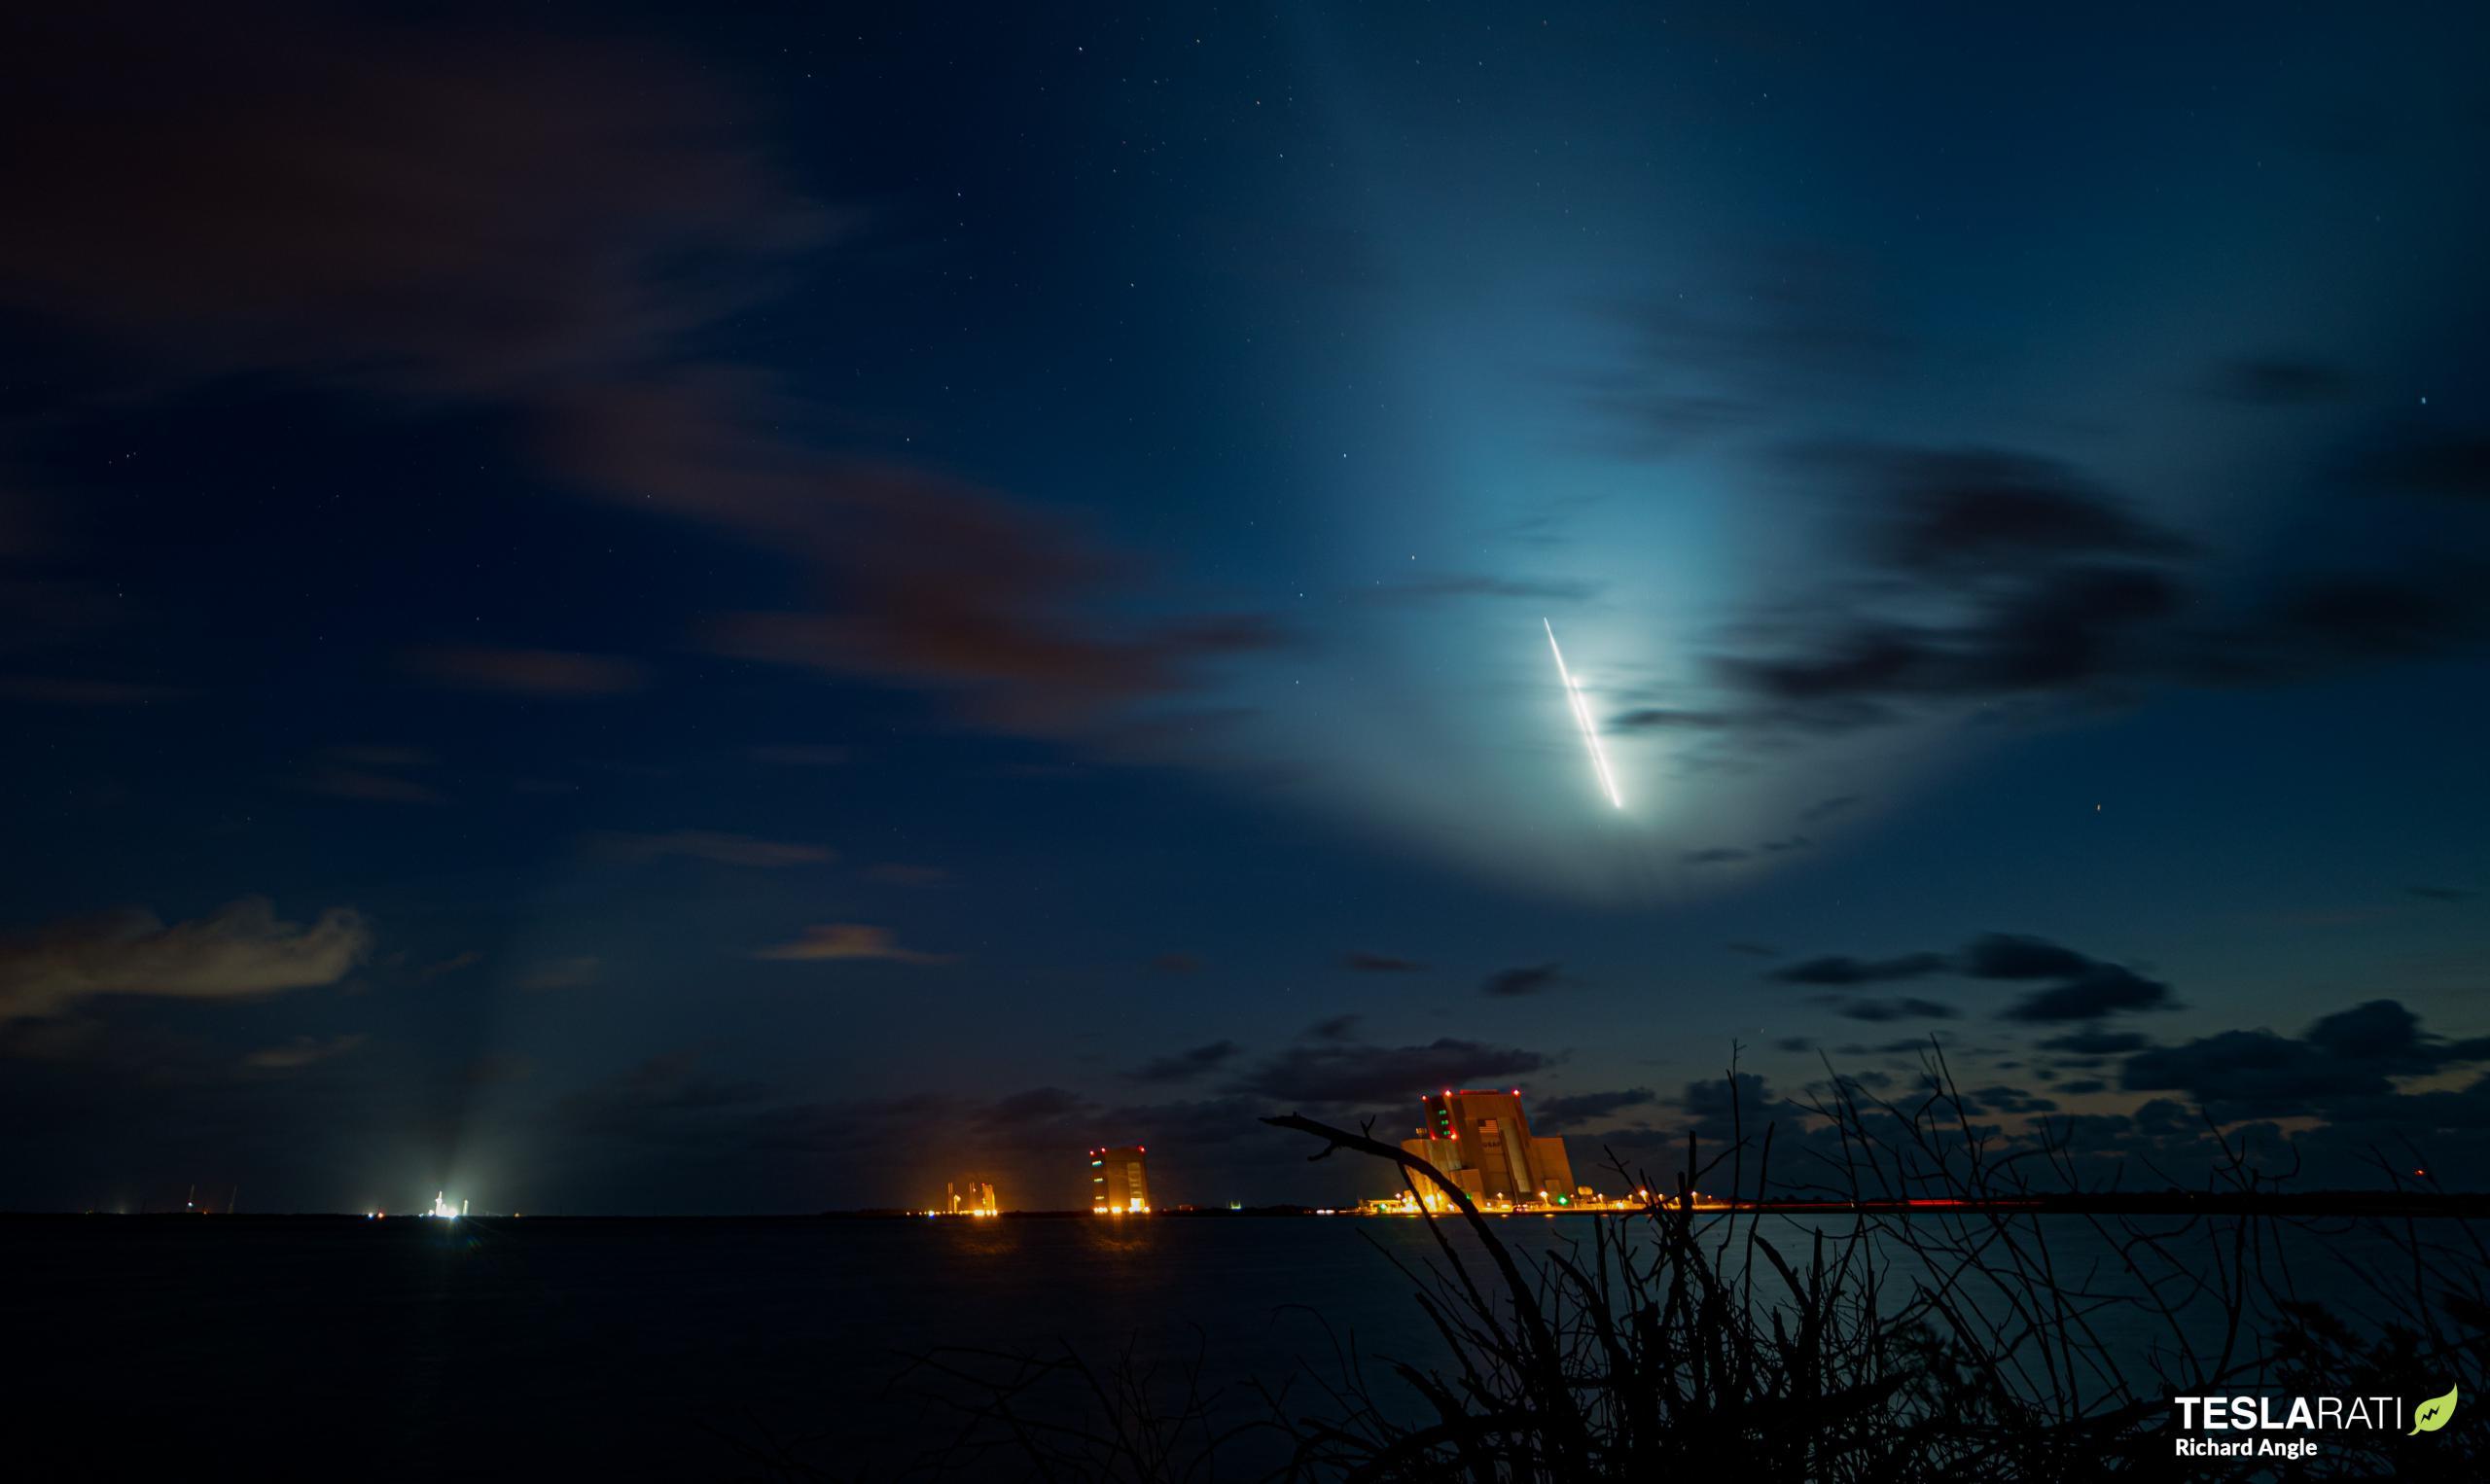 Crew-2 Crew Dragon C206 Falcon 9 B1061 39A 042321 (Richard Angle) streak 2 crop (c)